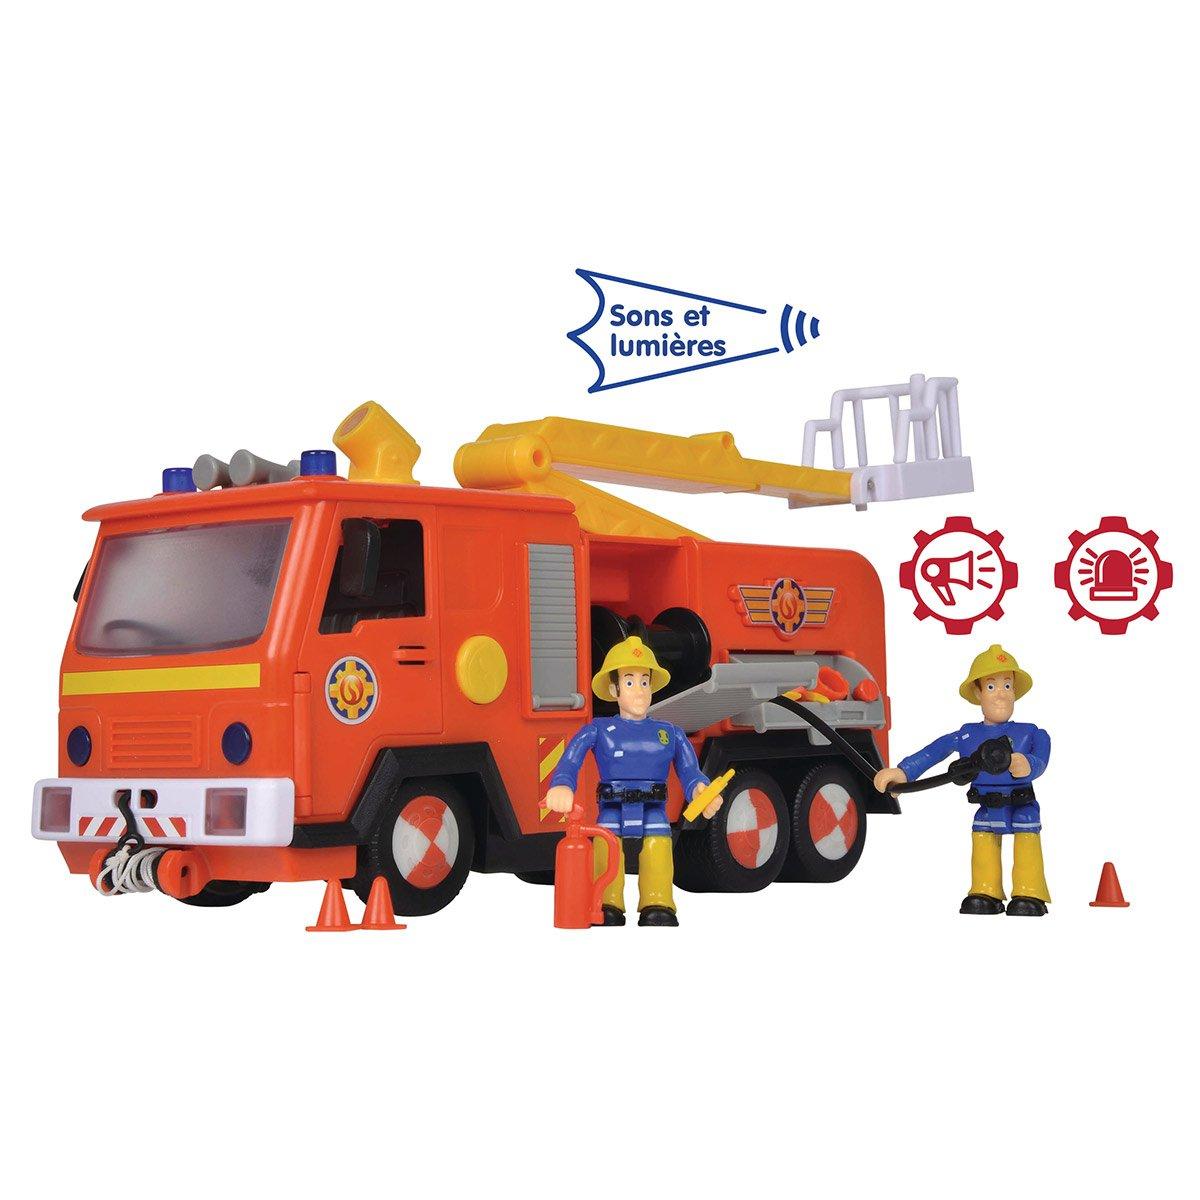 Camion De Pompier Jupiter Et Figurines Sam Le Pompier à Jeux De Camion De Pompier Gratuit